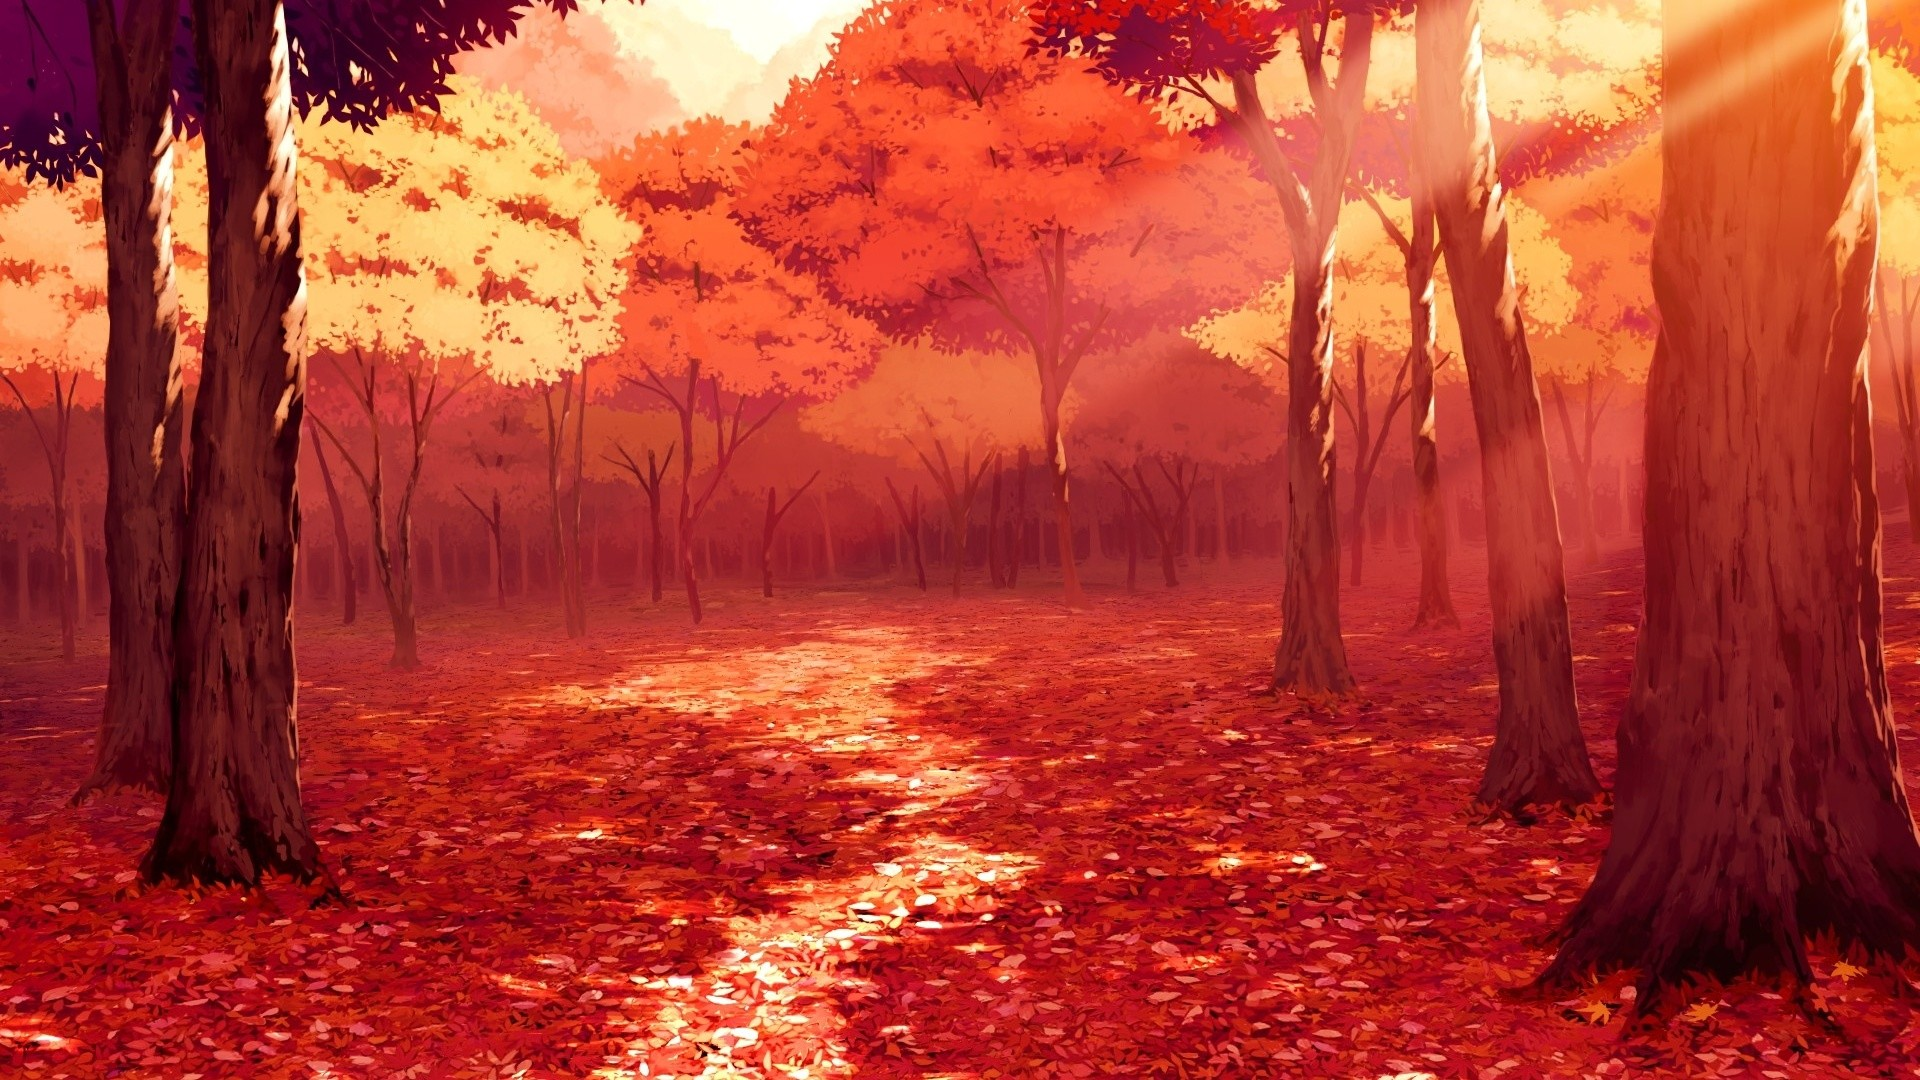 Gorgeous Anime Scenery Wallpaper 42590